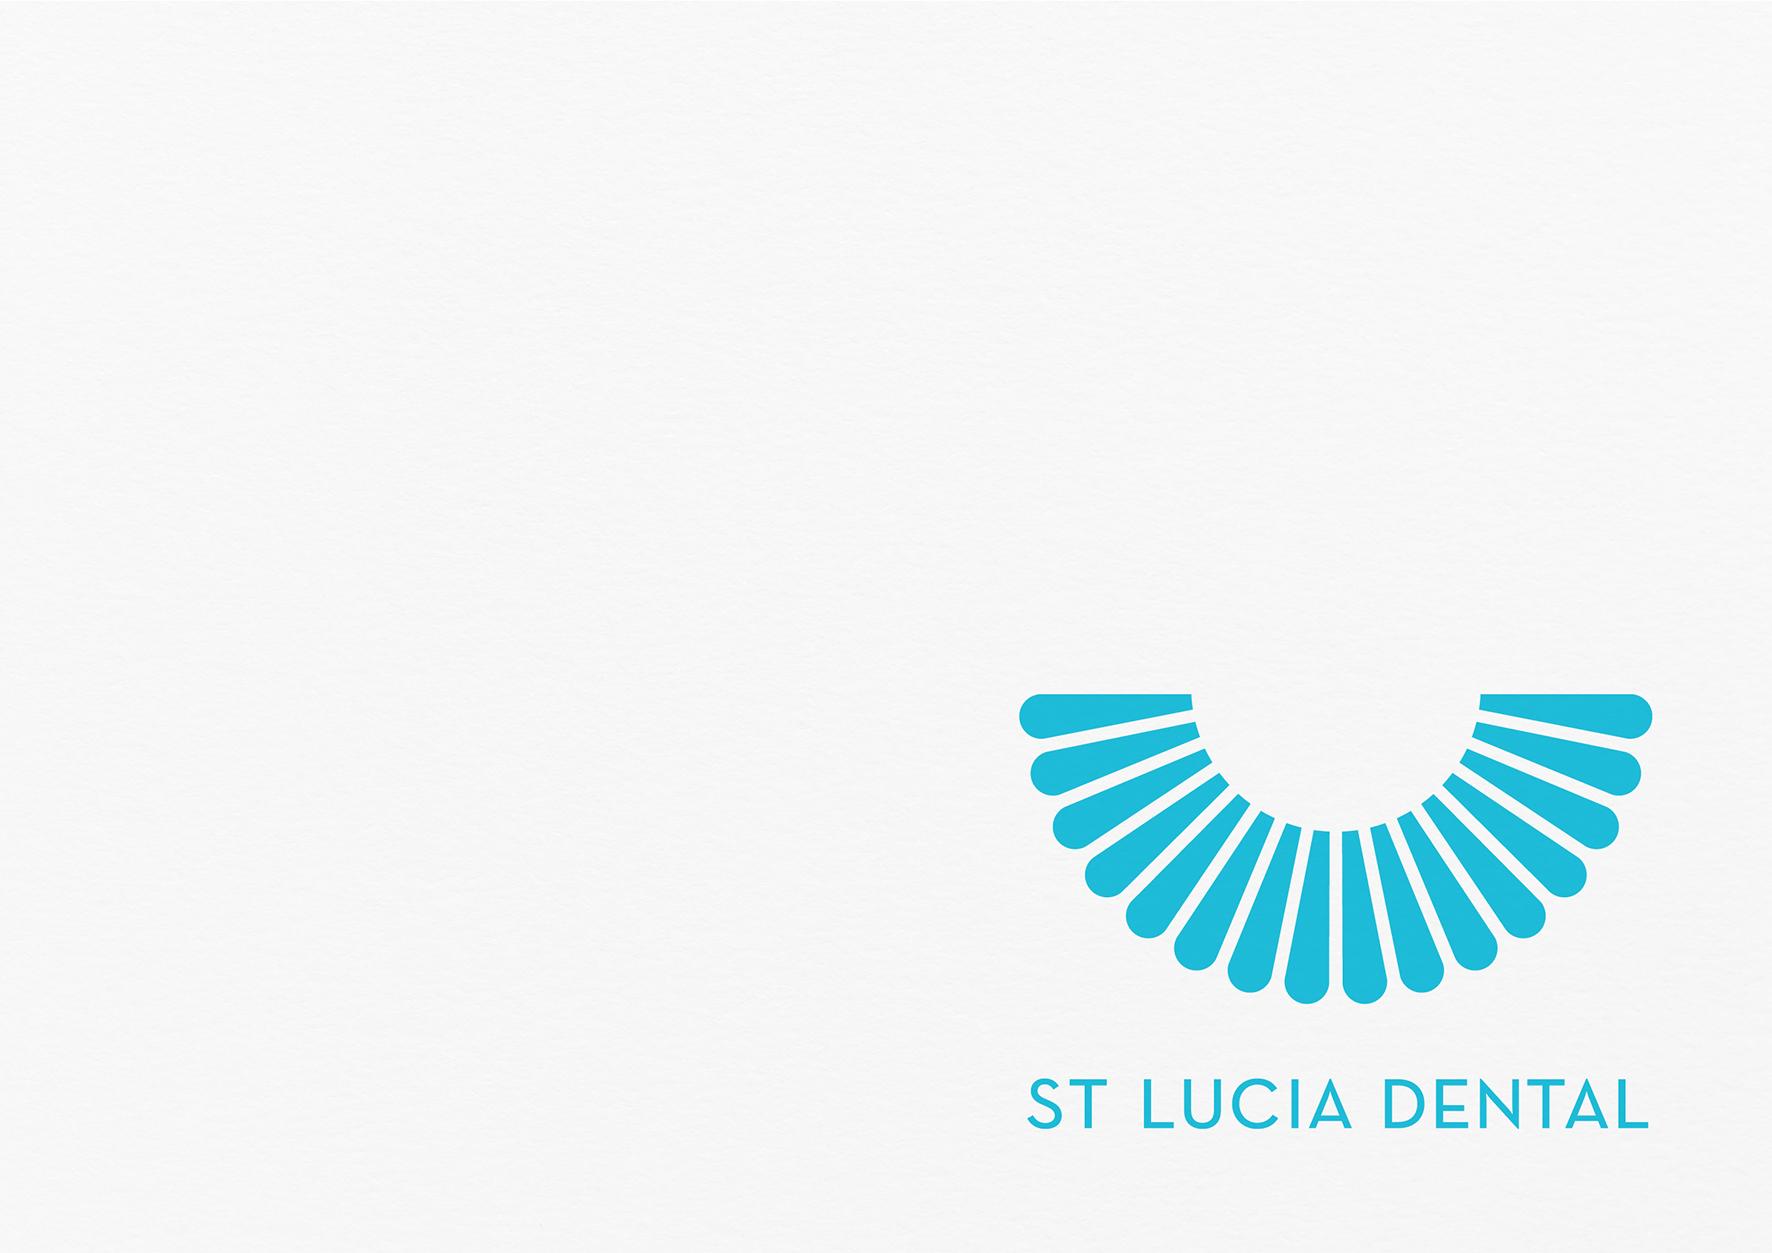 Big_CS_St Lucia Dental 17-01.jpg